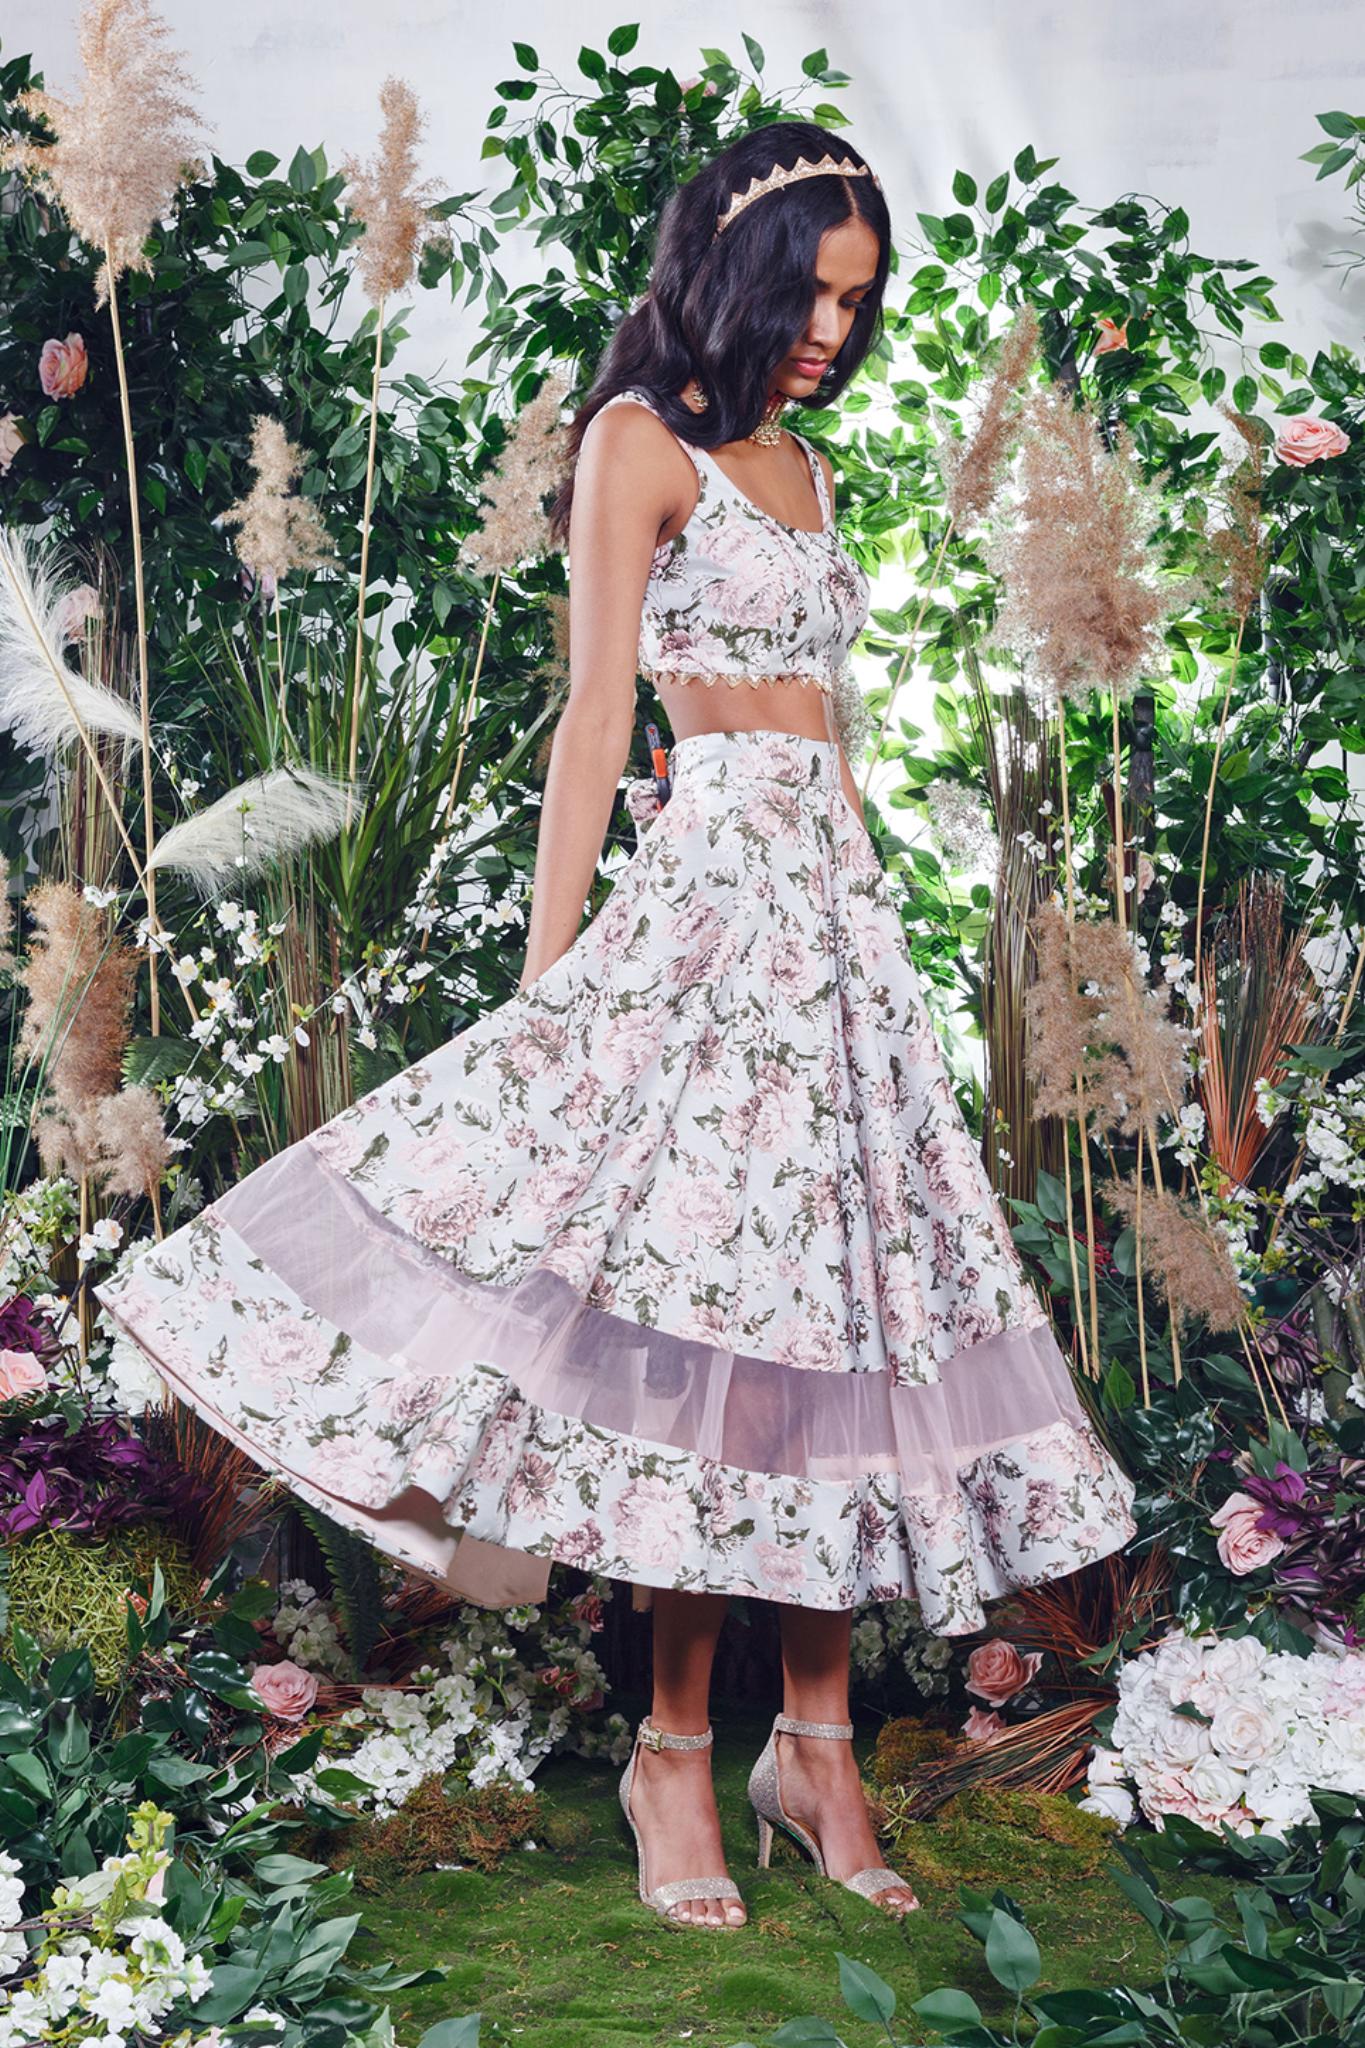 1 Tea Party Set Manijassal Tea Length Skirt Tea Party Setting Toronto Fashion Week [ 2048 x 1365 Pixel ]